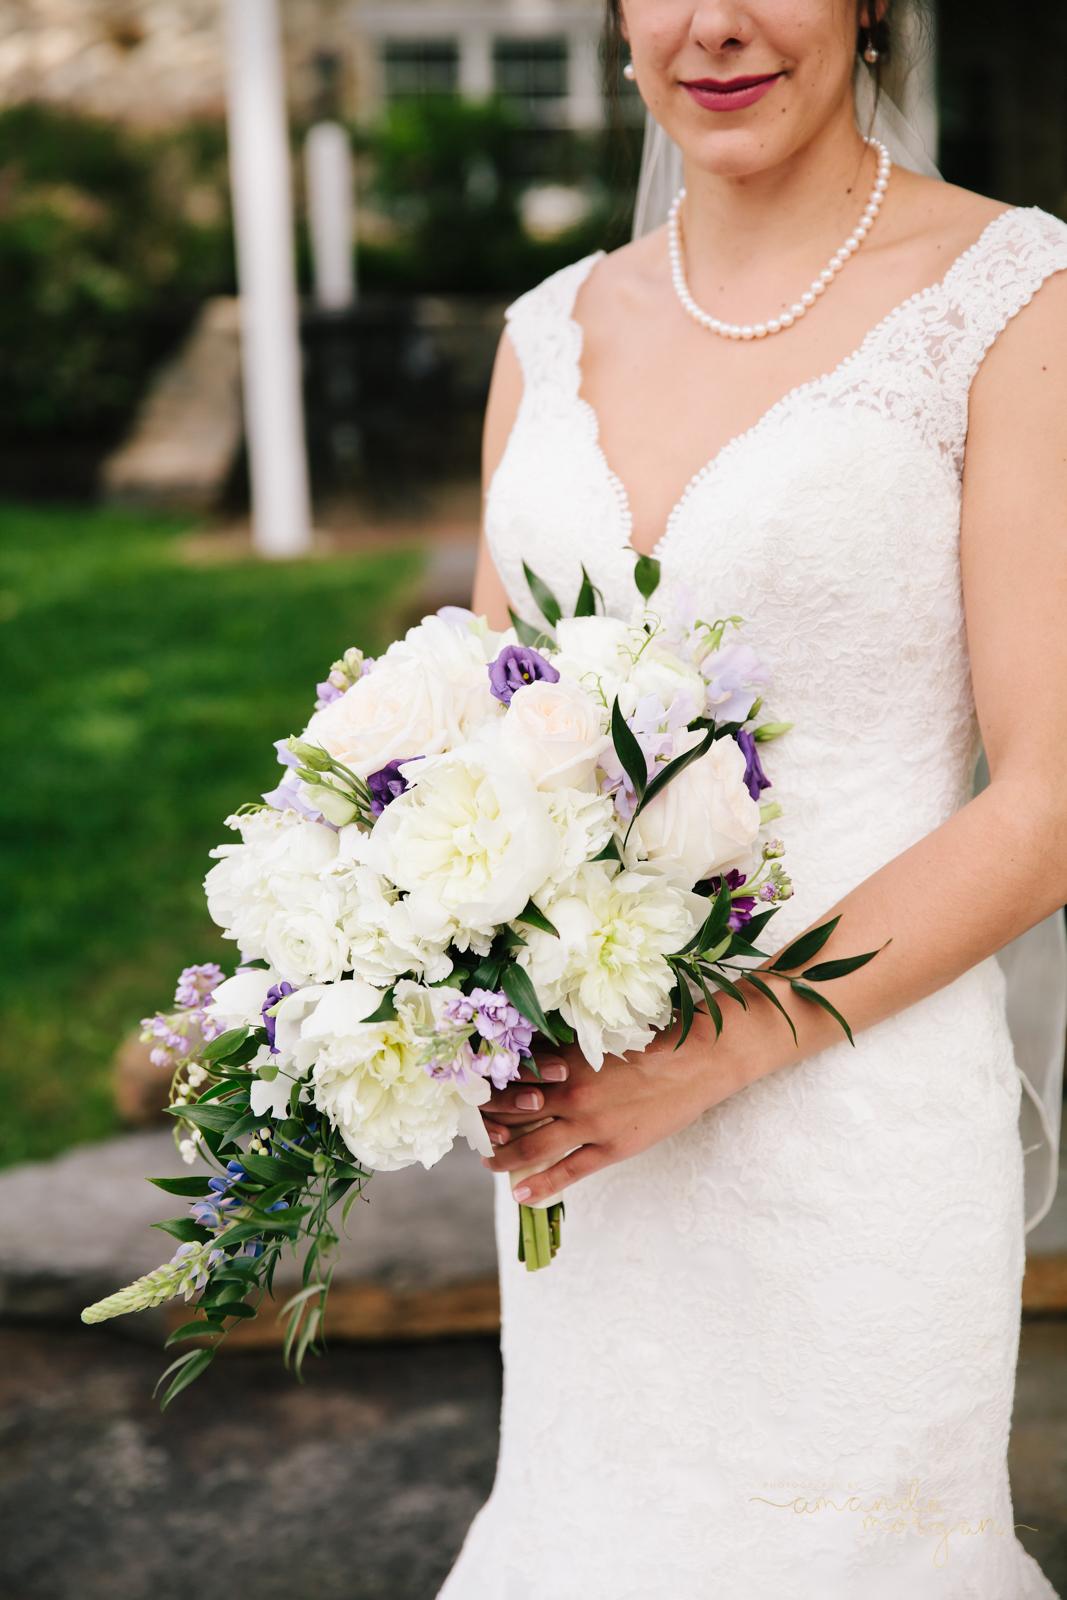 Publick-House-Wedding-Amanda-Morgan-16.jpg